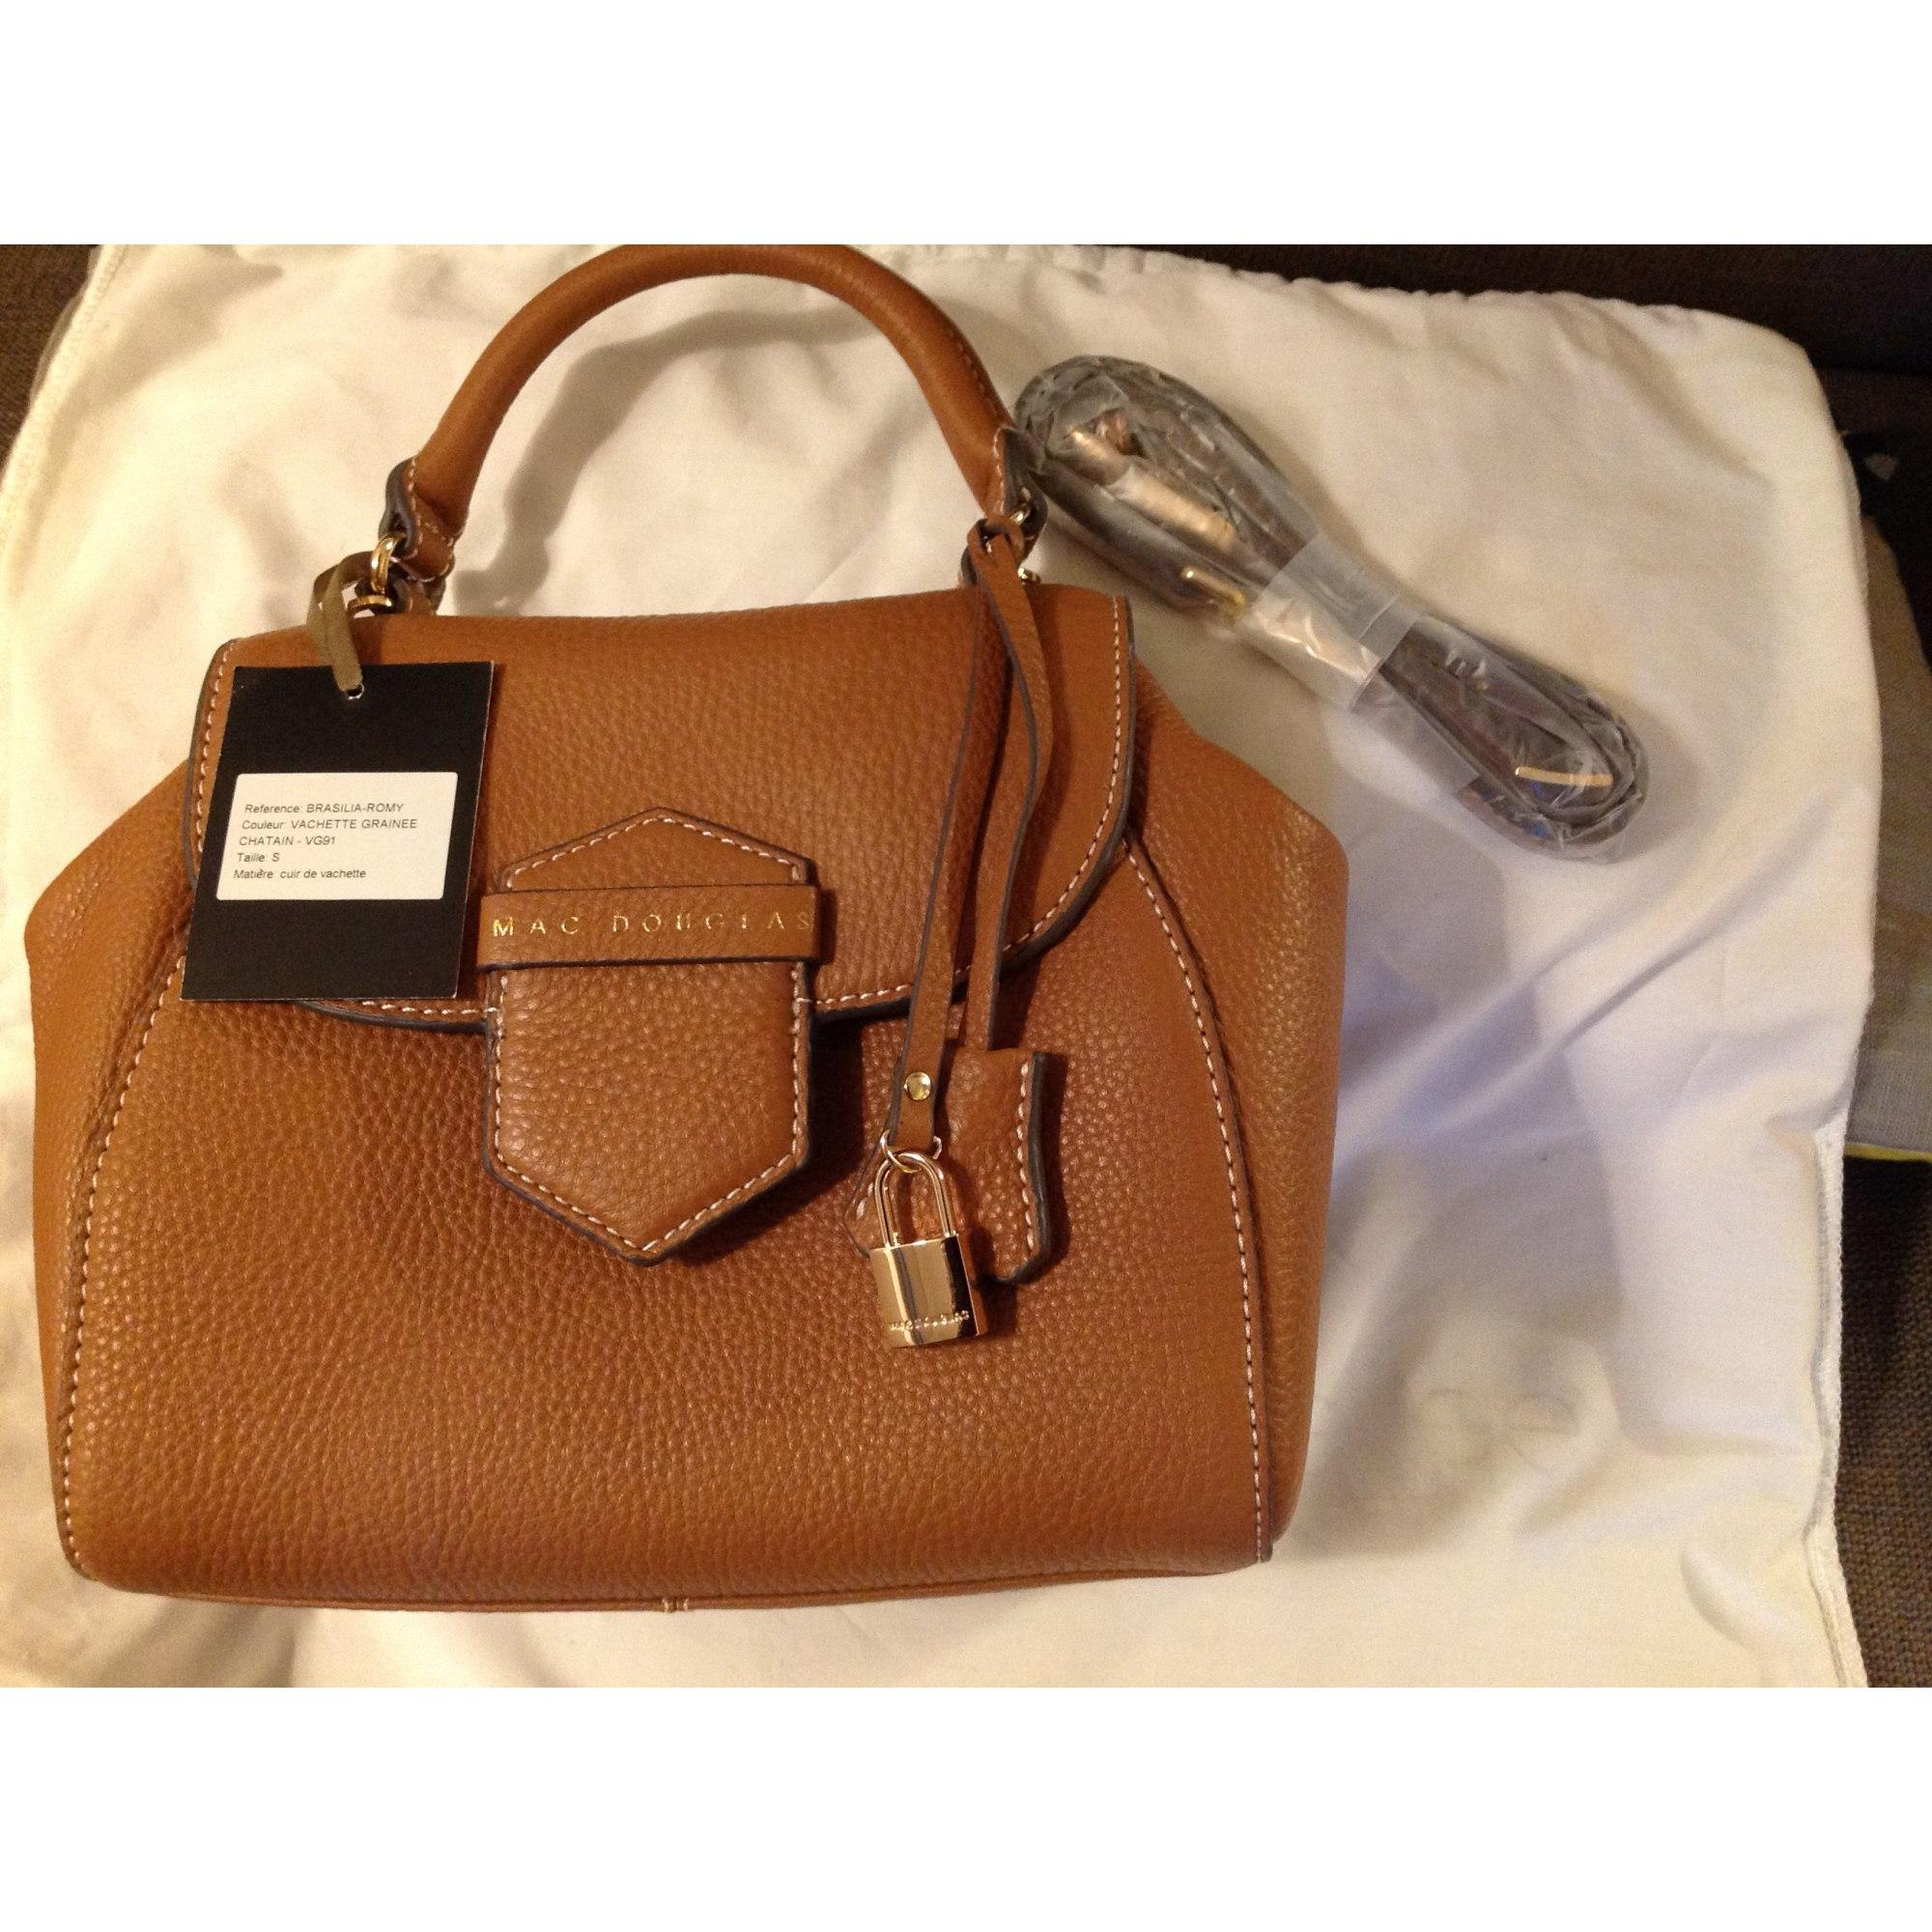 a610b5fa05e Sac à main en cuir MAC DOUGLAS marron vendu par Nathalie 679541081 ...